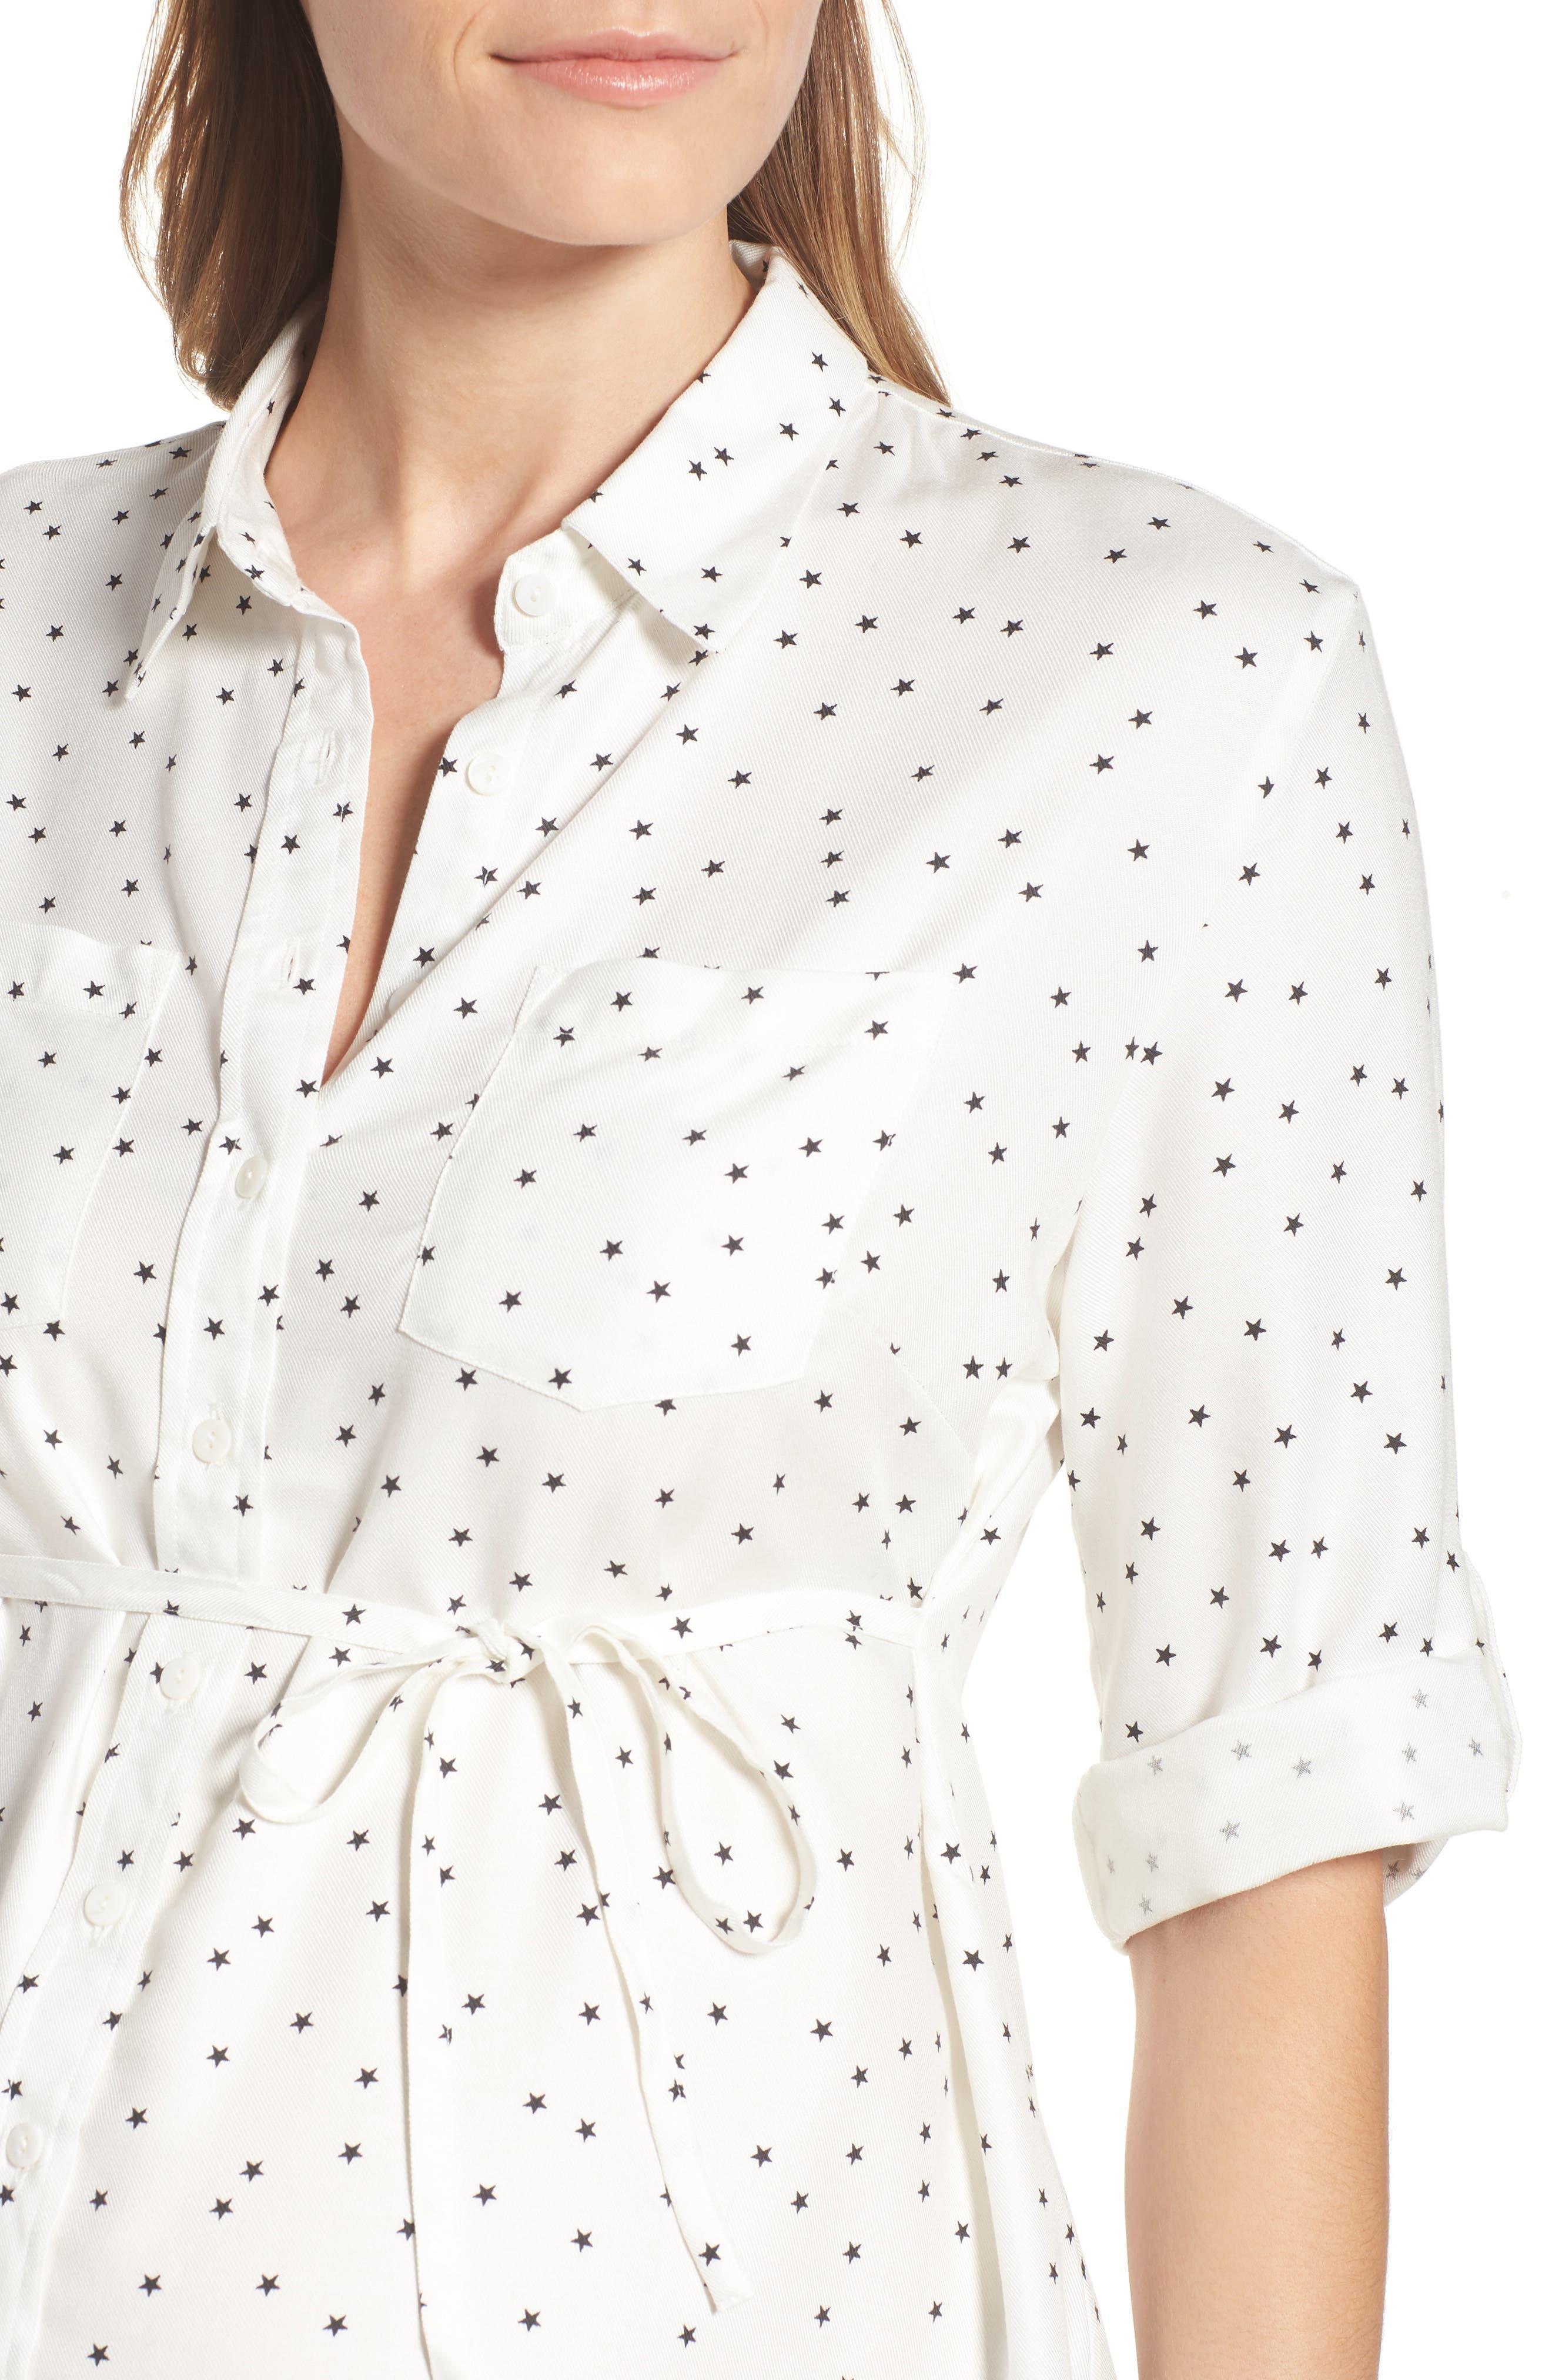 Selina Maternity Shirt,                             Alternate thumbnail 4, color,                             Off White Star Print